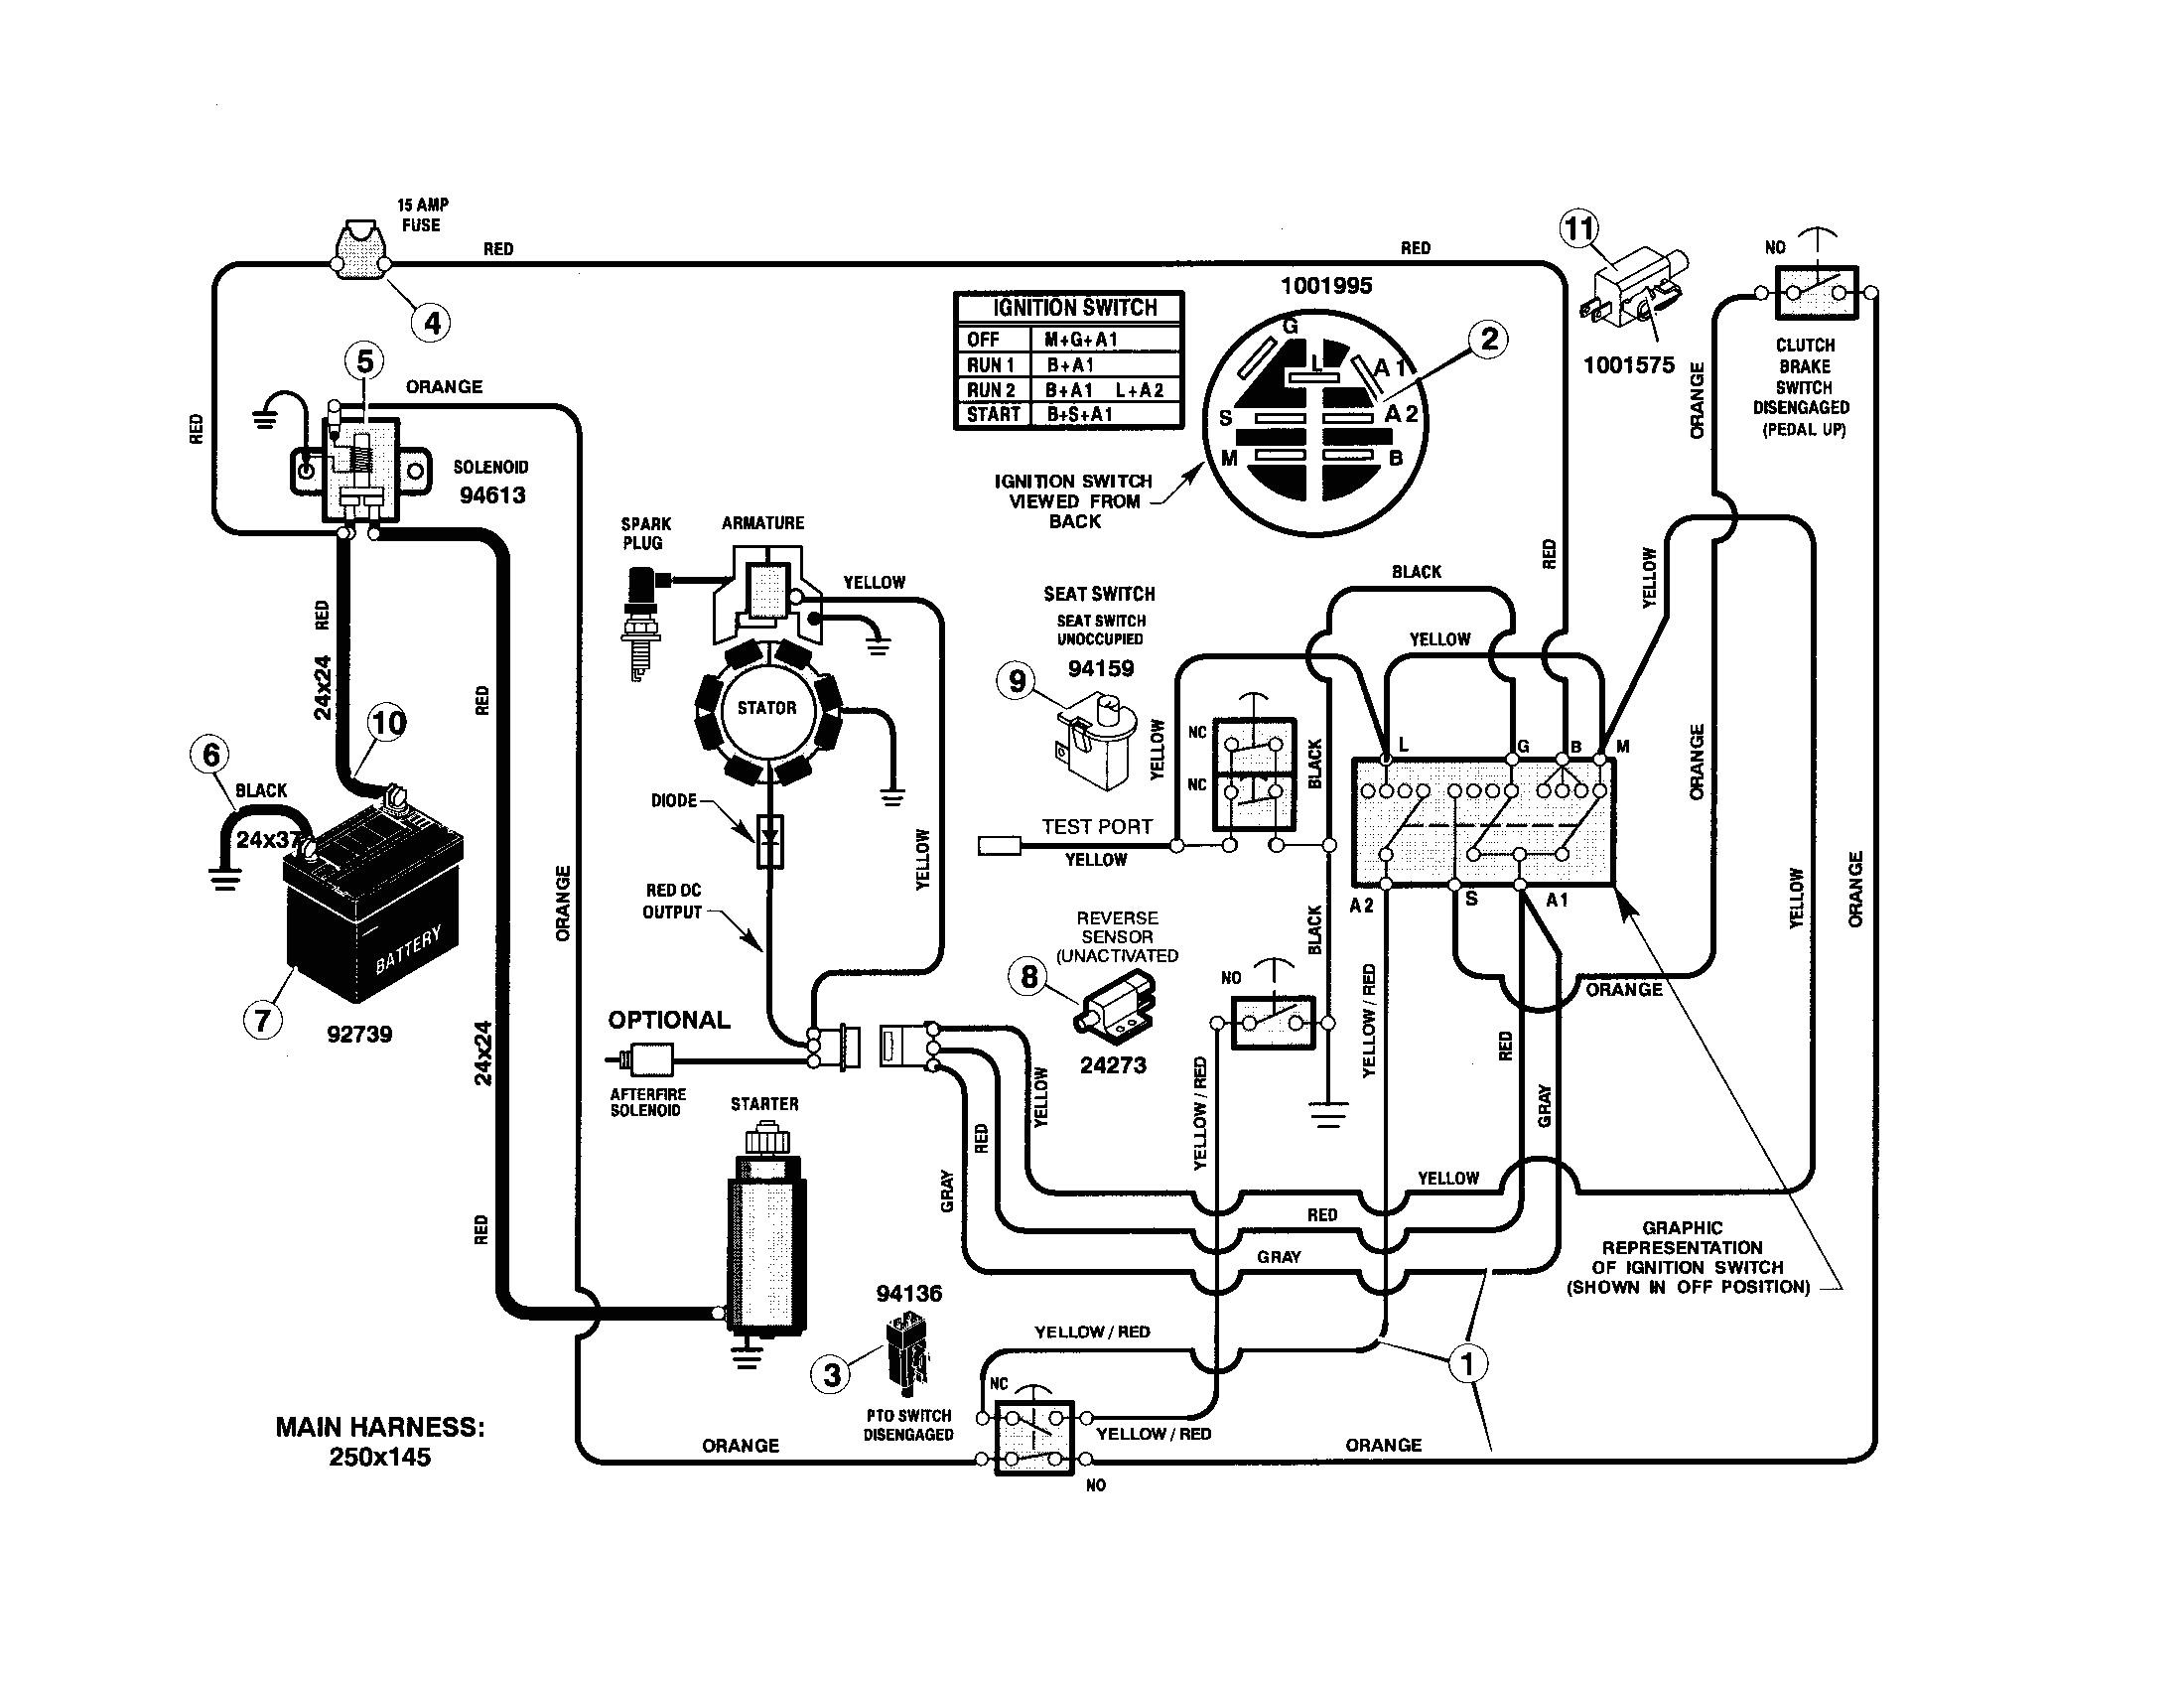 mtd huskee 20 hp wire diagram wiring diagram show huskee lt 4200 wiring diagram